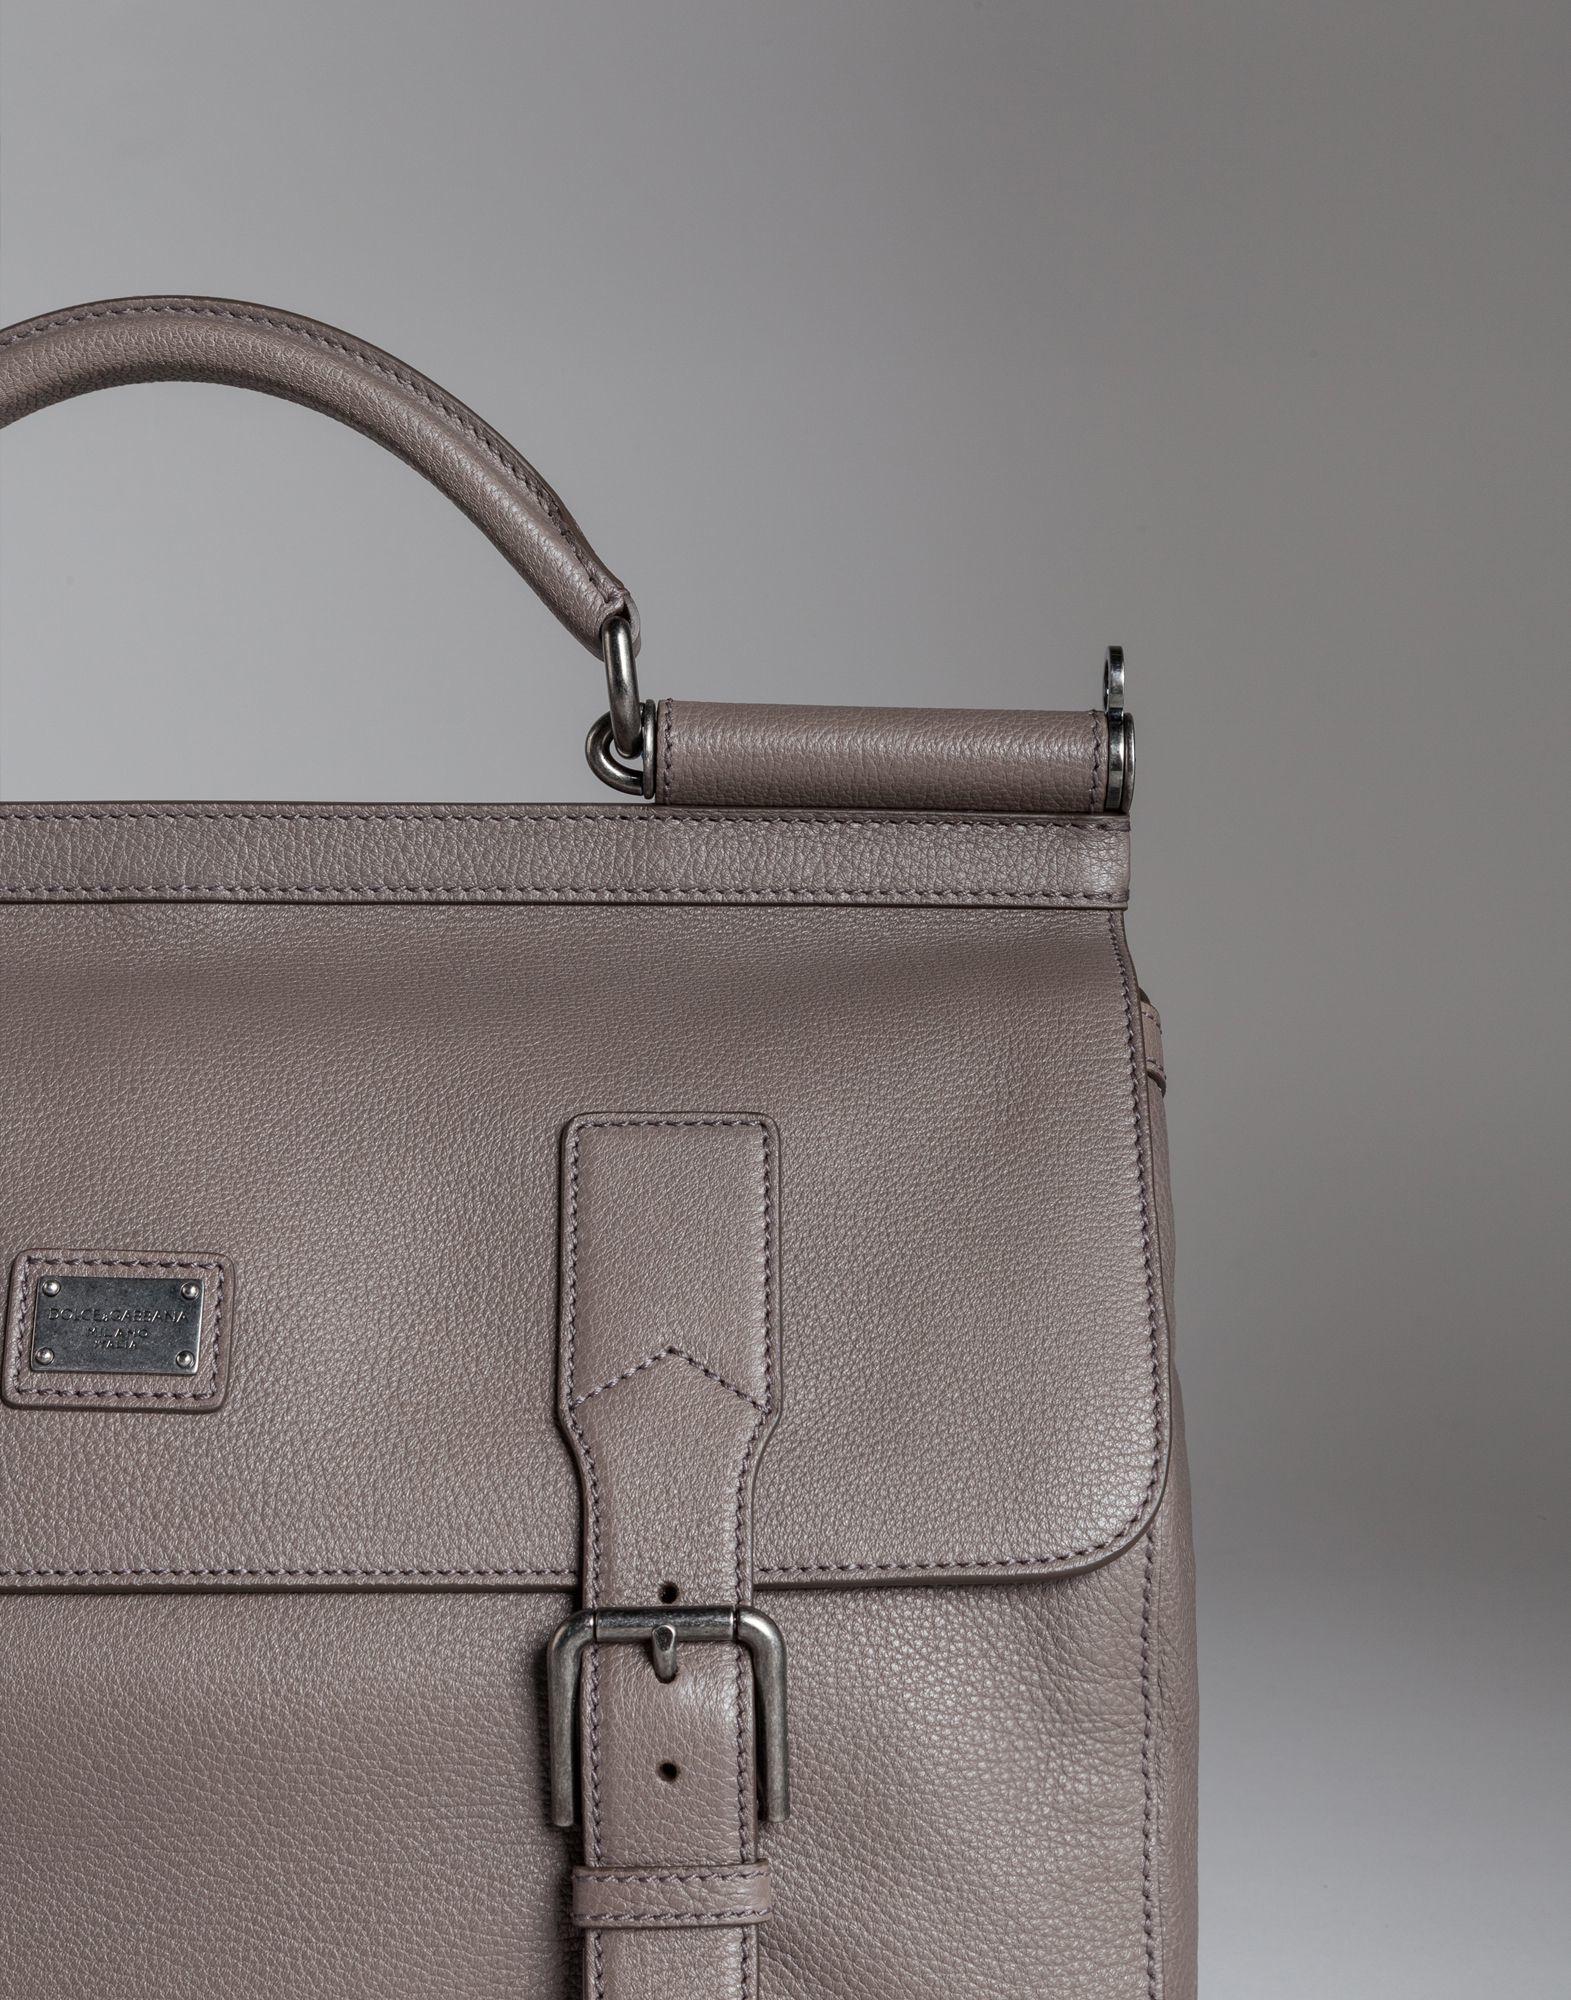 6ba2bb81c9 Lyst - Dolce   Gabbana Sicily Travel Bag In Leather in Gray for Men